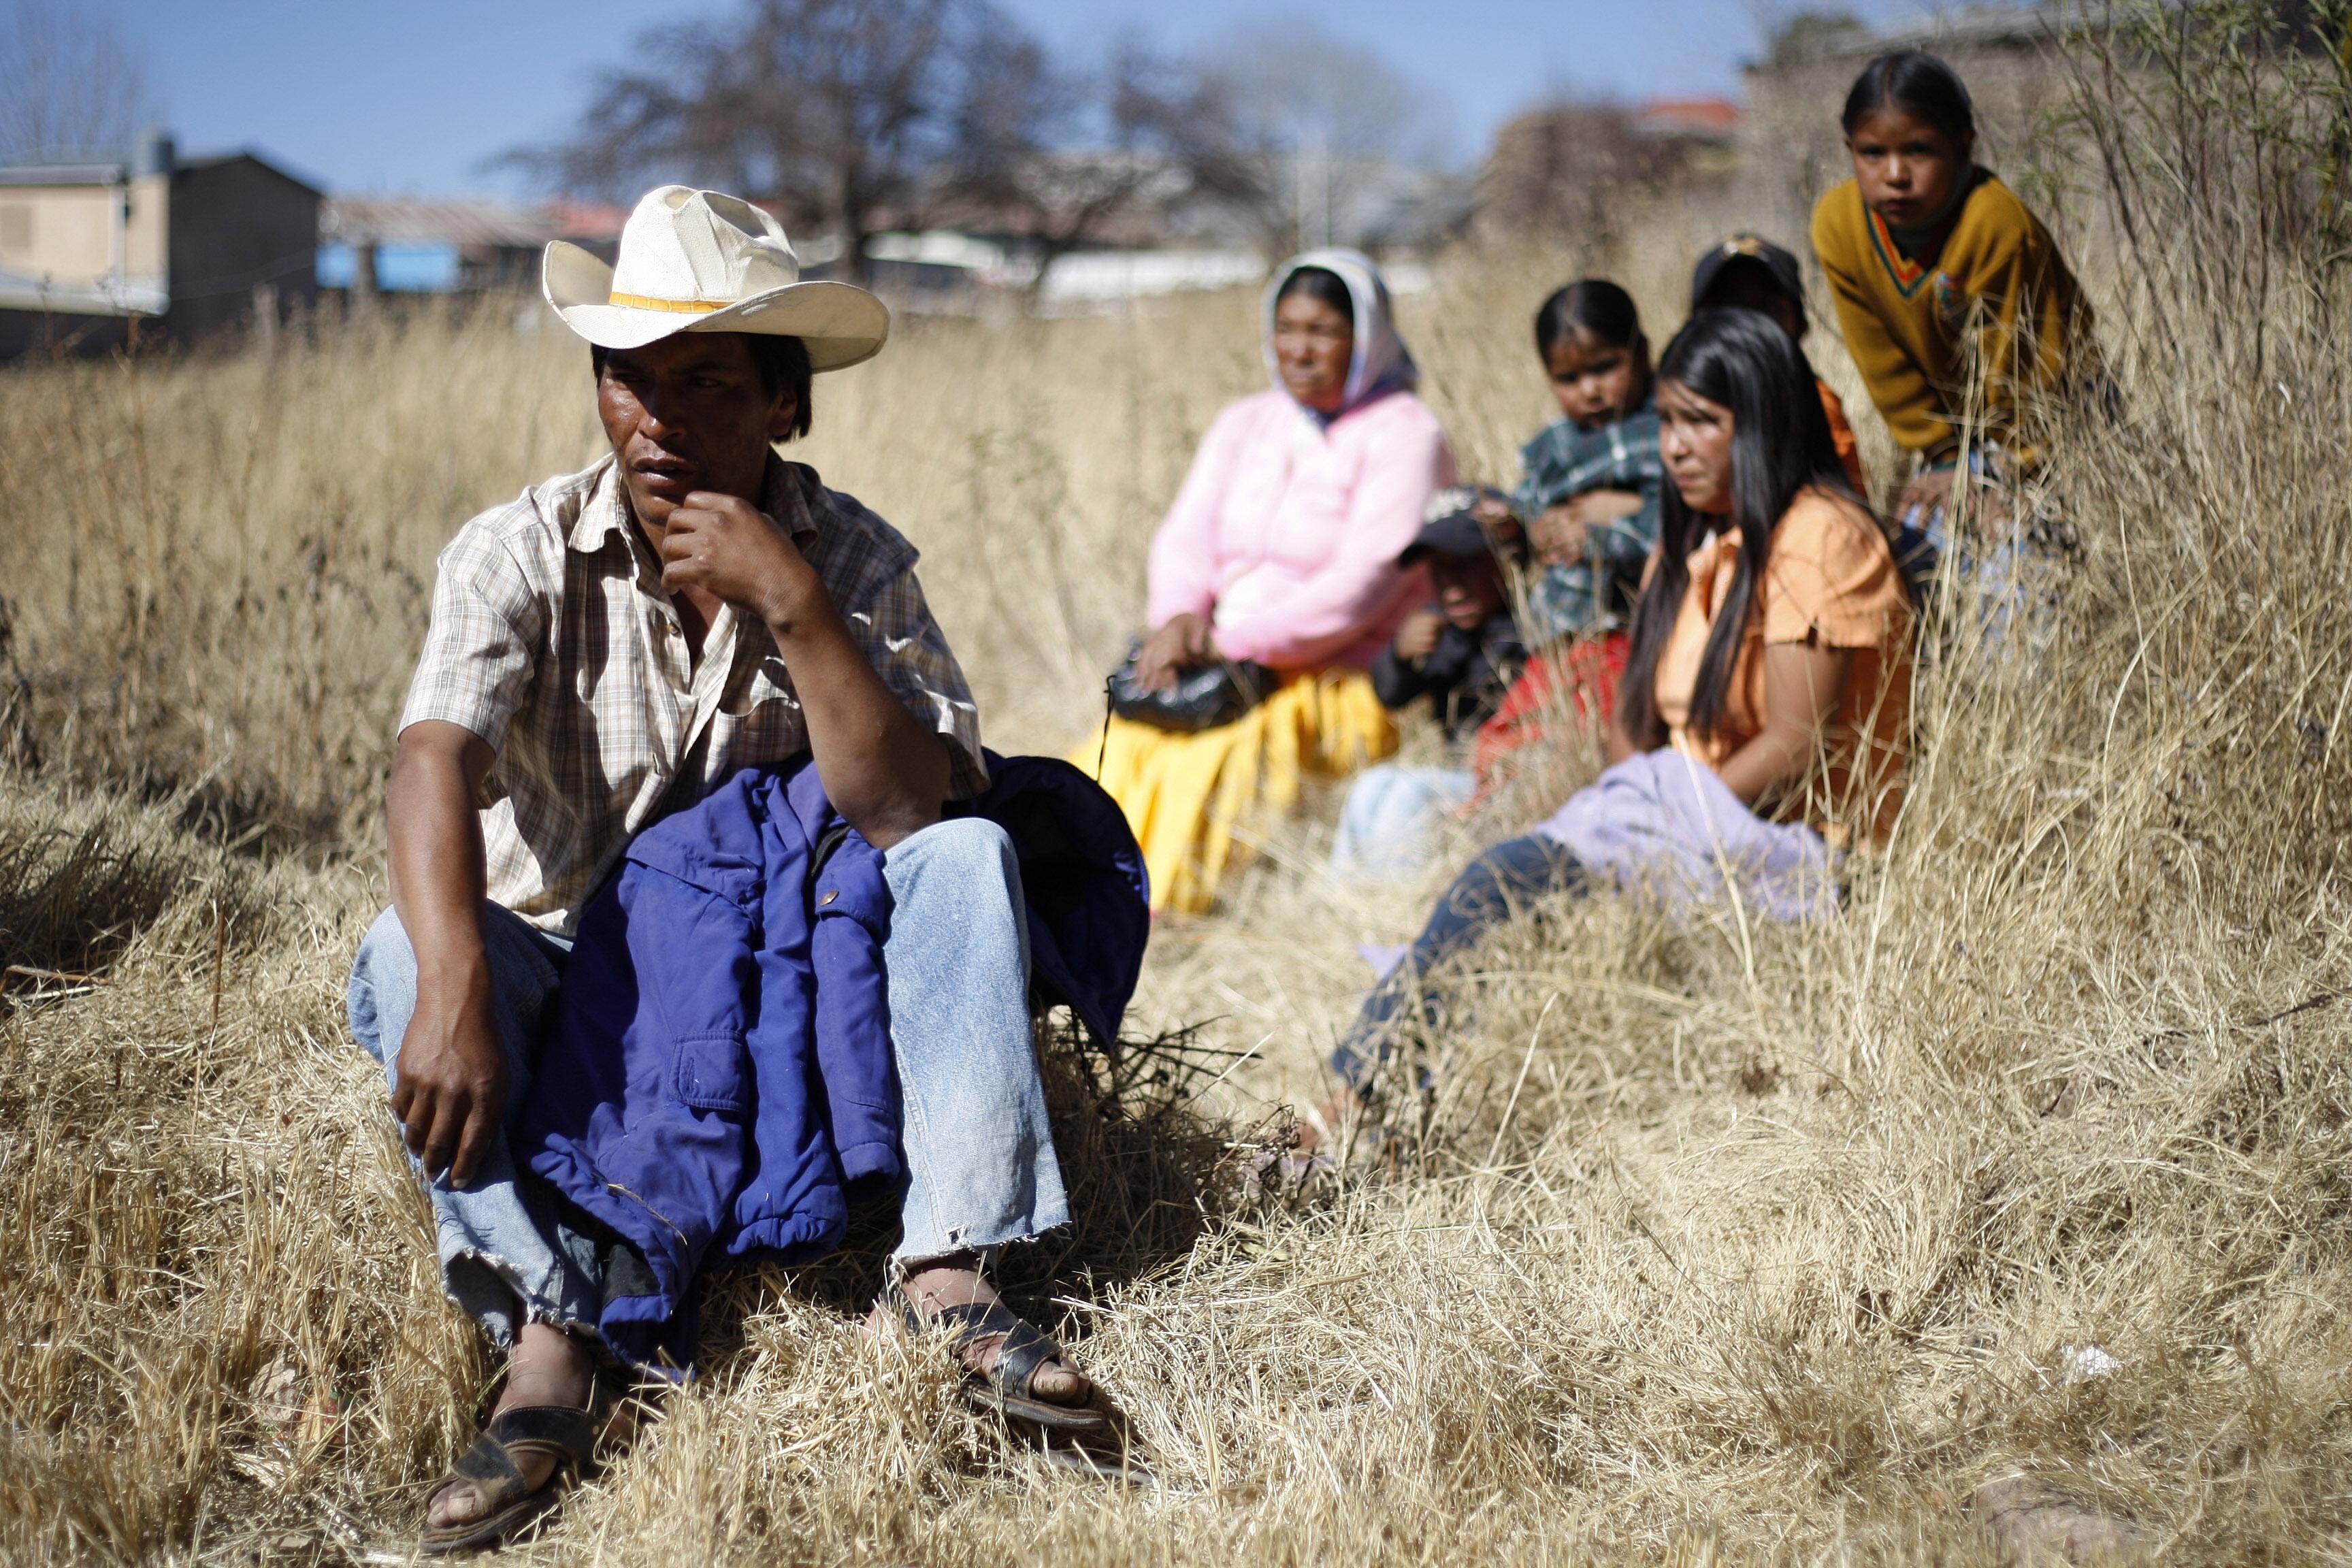 Tarahumara Indigenous family sits together in Guachochi November 30, 2011.